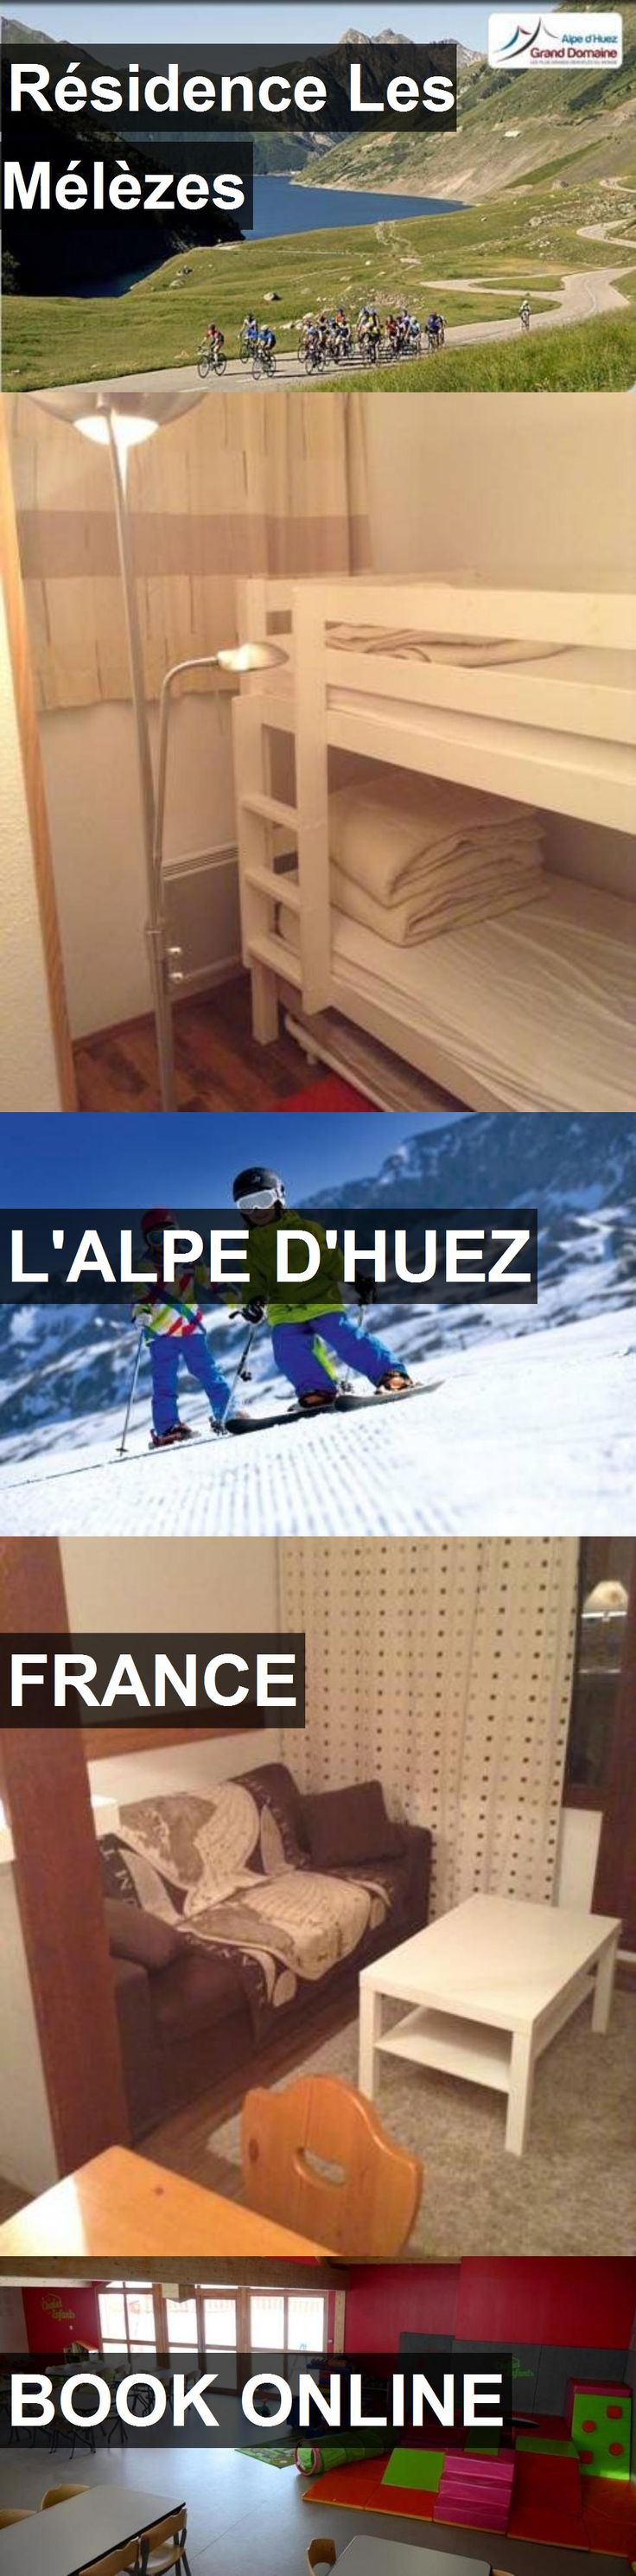 Hotel Résidence Les Mélèzes in L'Alpe d'Huez, France. For more information, photos, reviews and best prices please follow the link. #France #L'Alped'Huez #travel #vacation #hotel